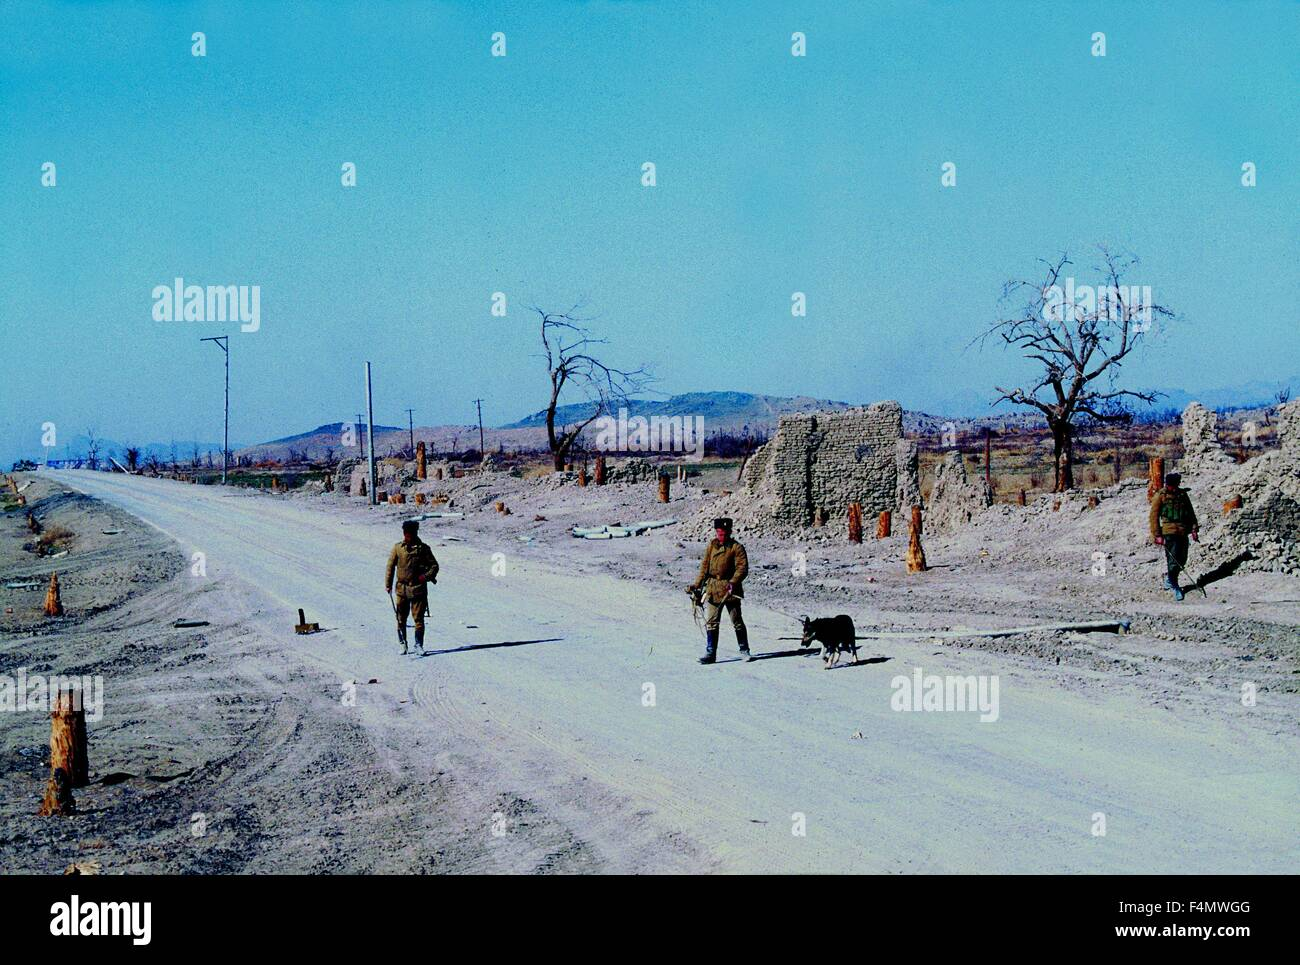 Soviet Afghanistan war - Page 6 Afghanistan-kandahar-1985-1986-F4MWGG